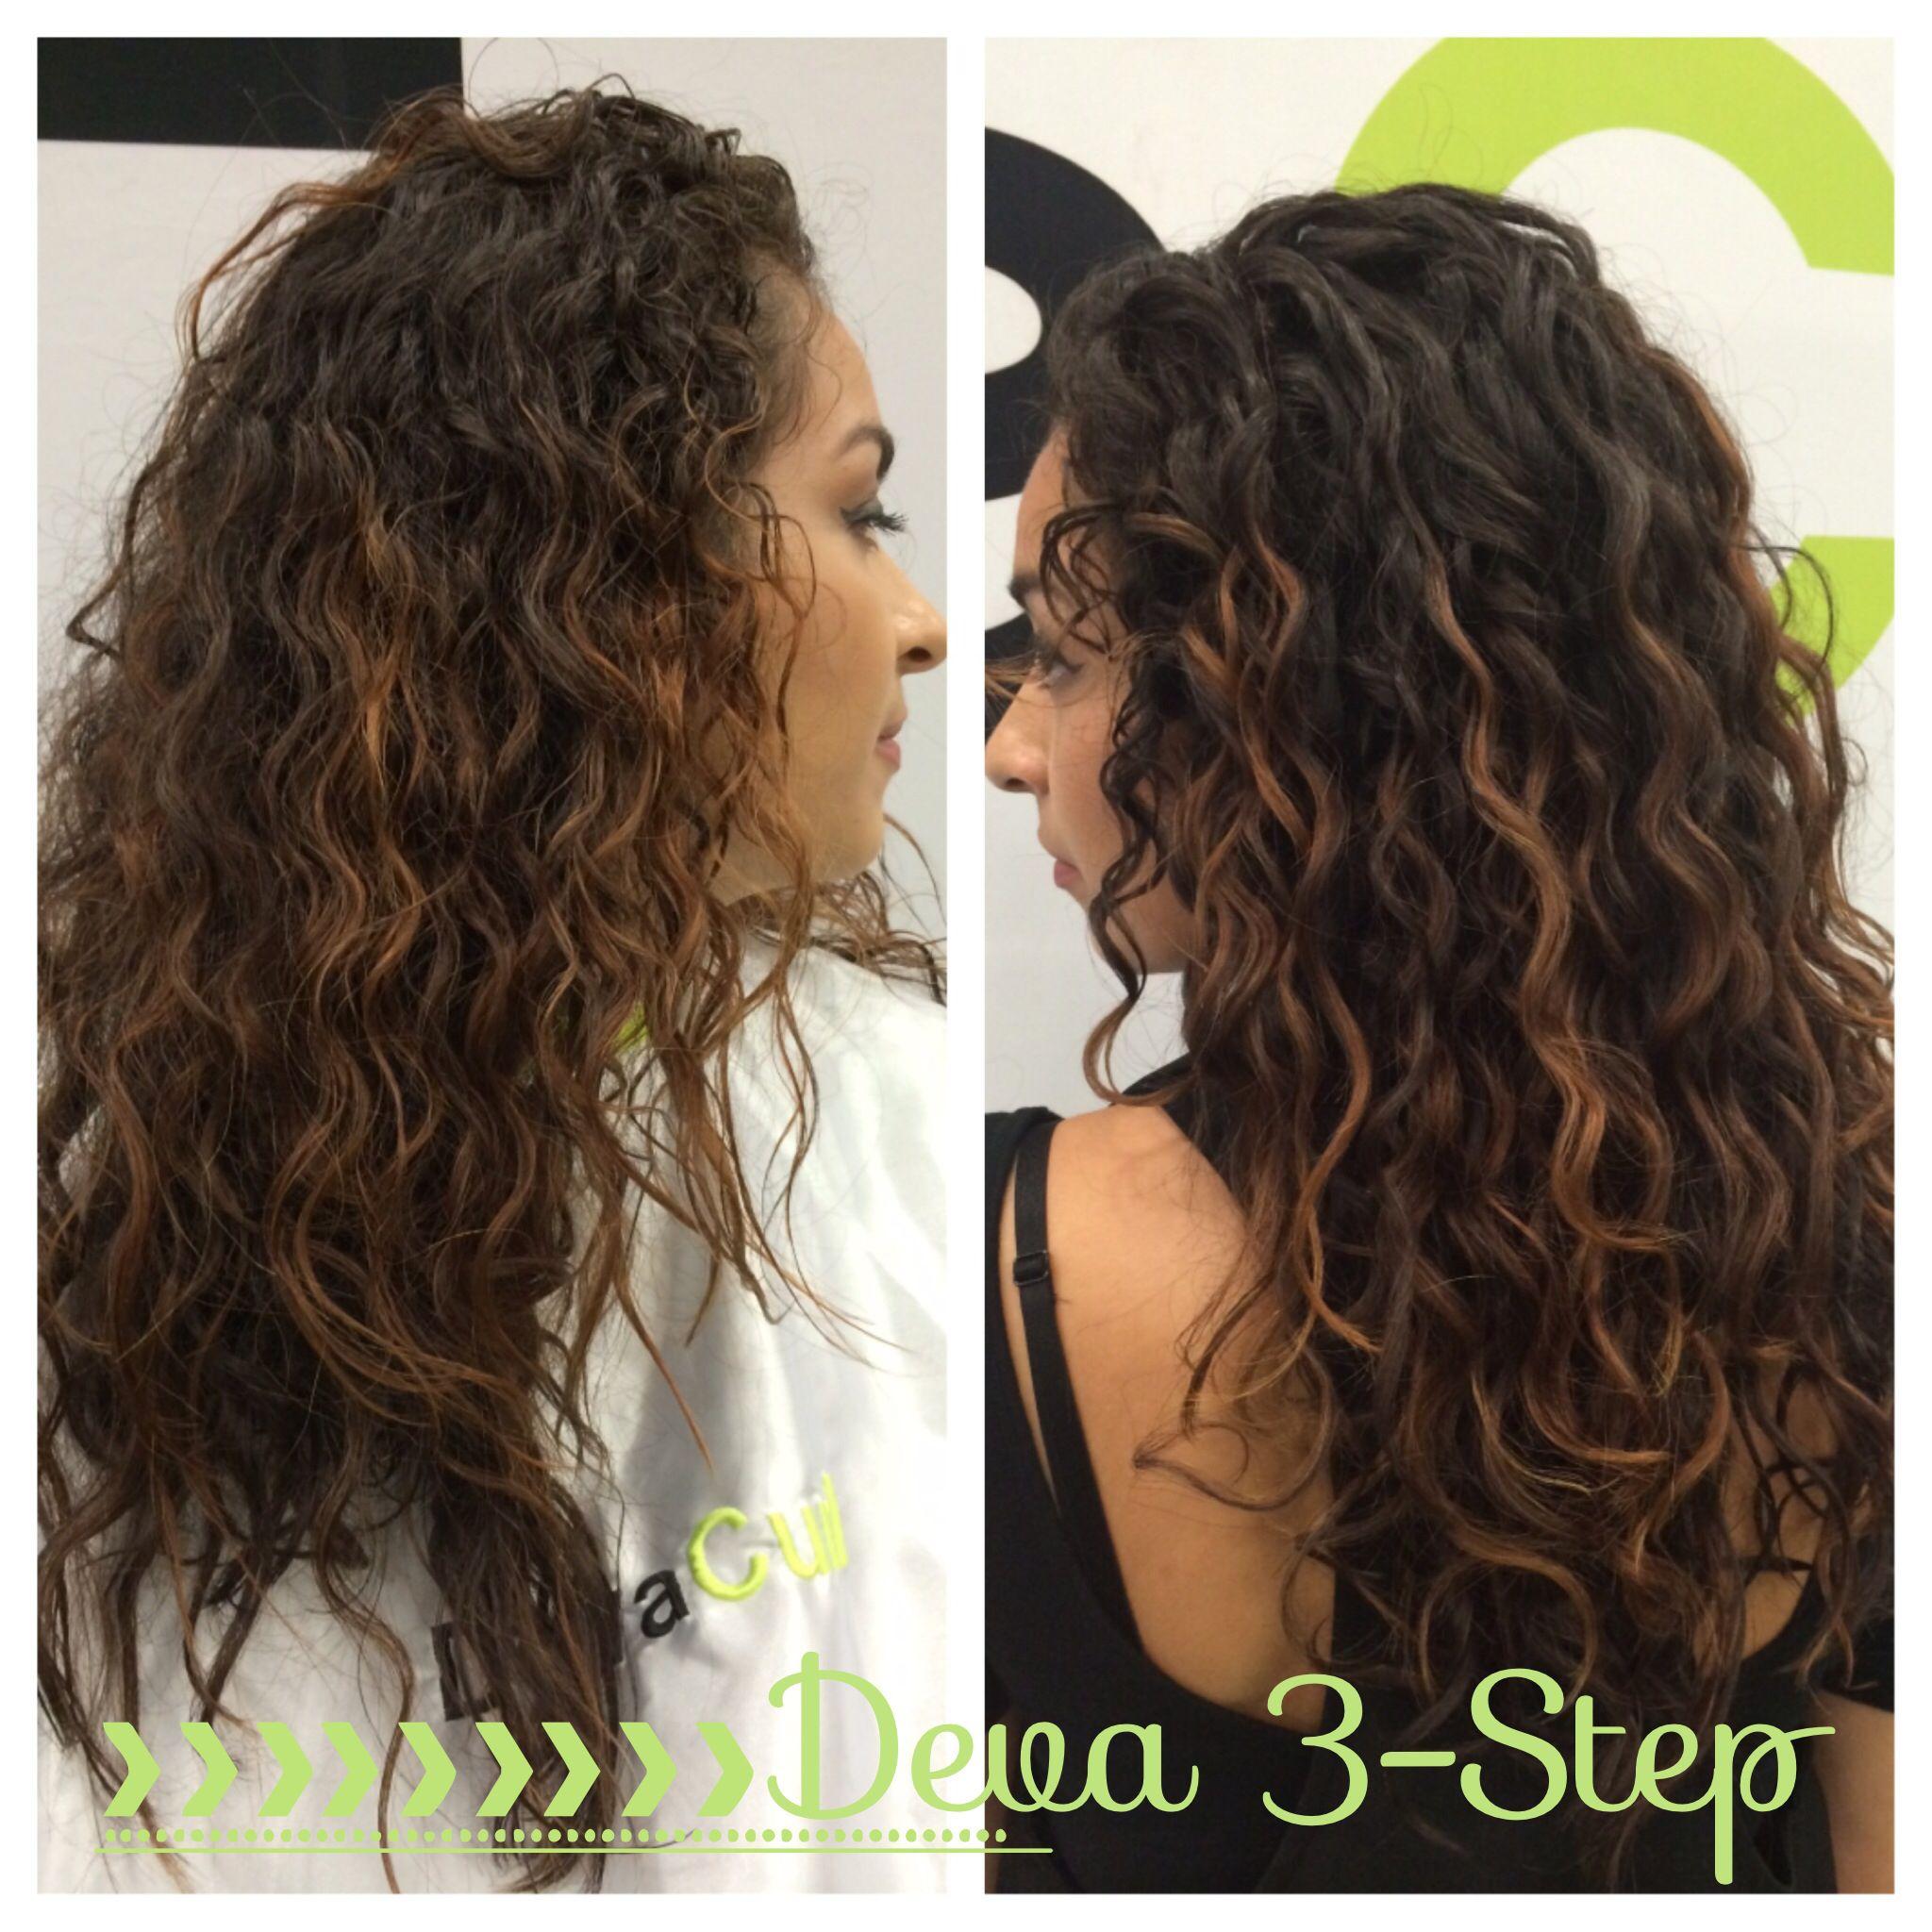 No Haircut Only One Application Of The Deva Curl 3 Step From Austin Hair Show Curly Hair Styles Hair Austin Hair